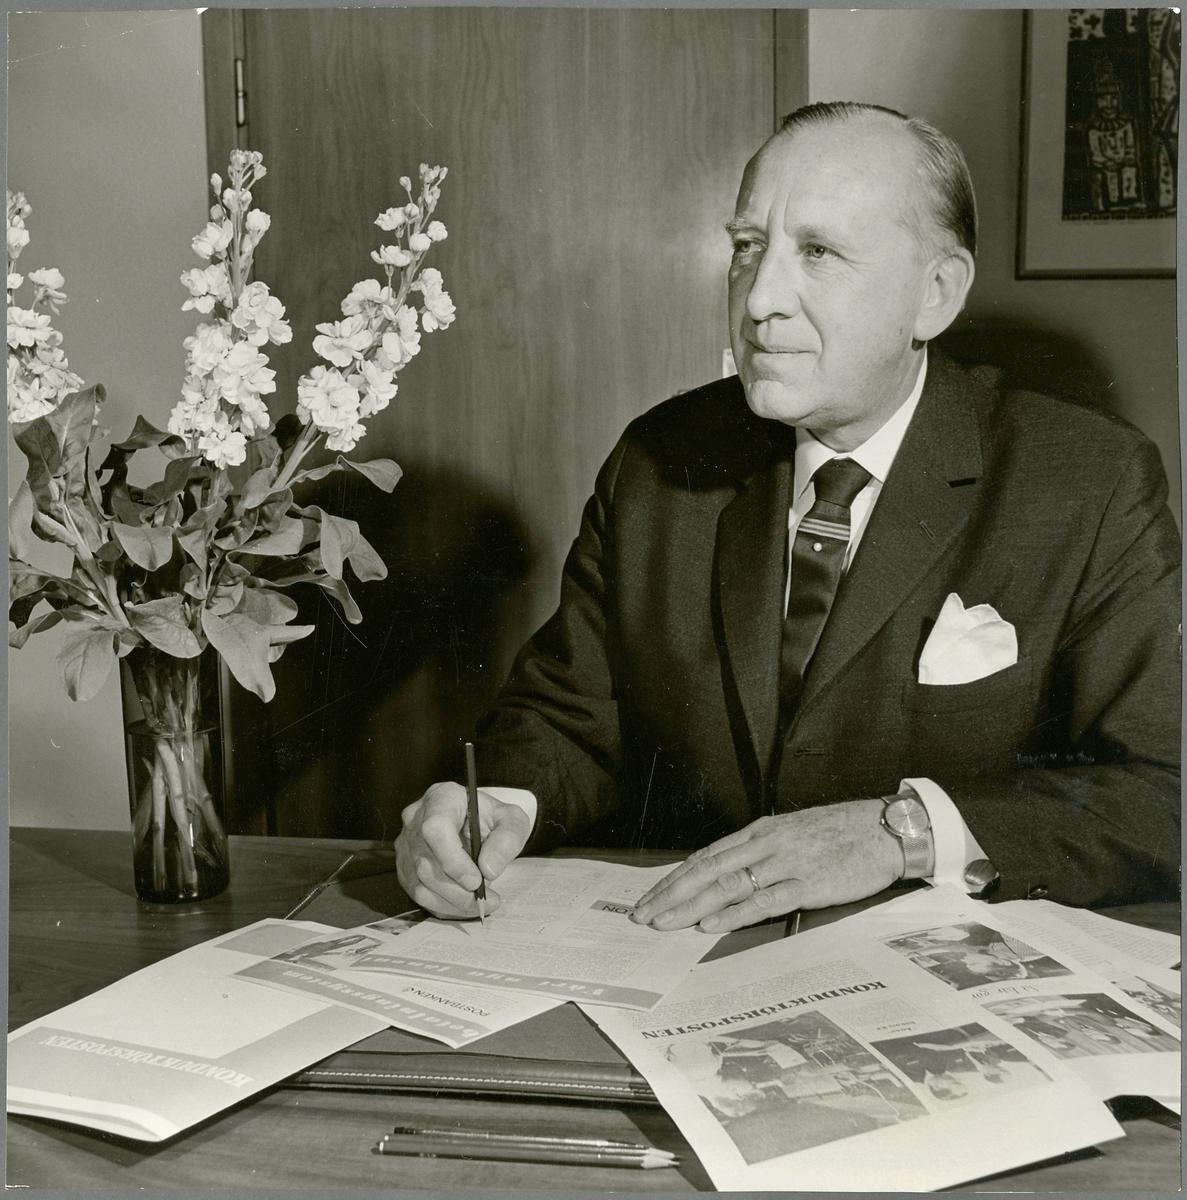 F. C. Karlströms arbete vid tidningen Konduktörsposten.